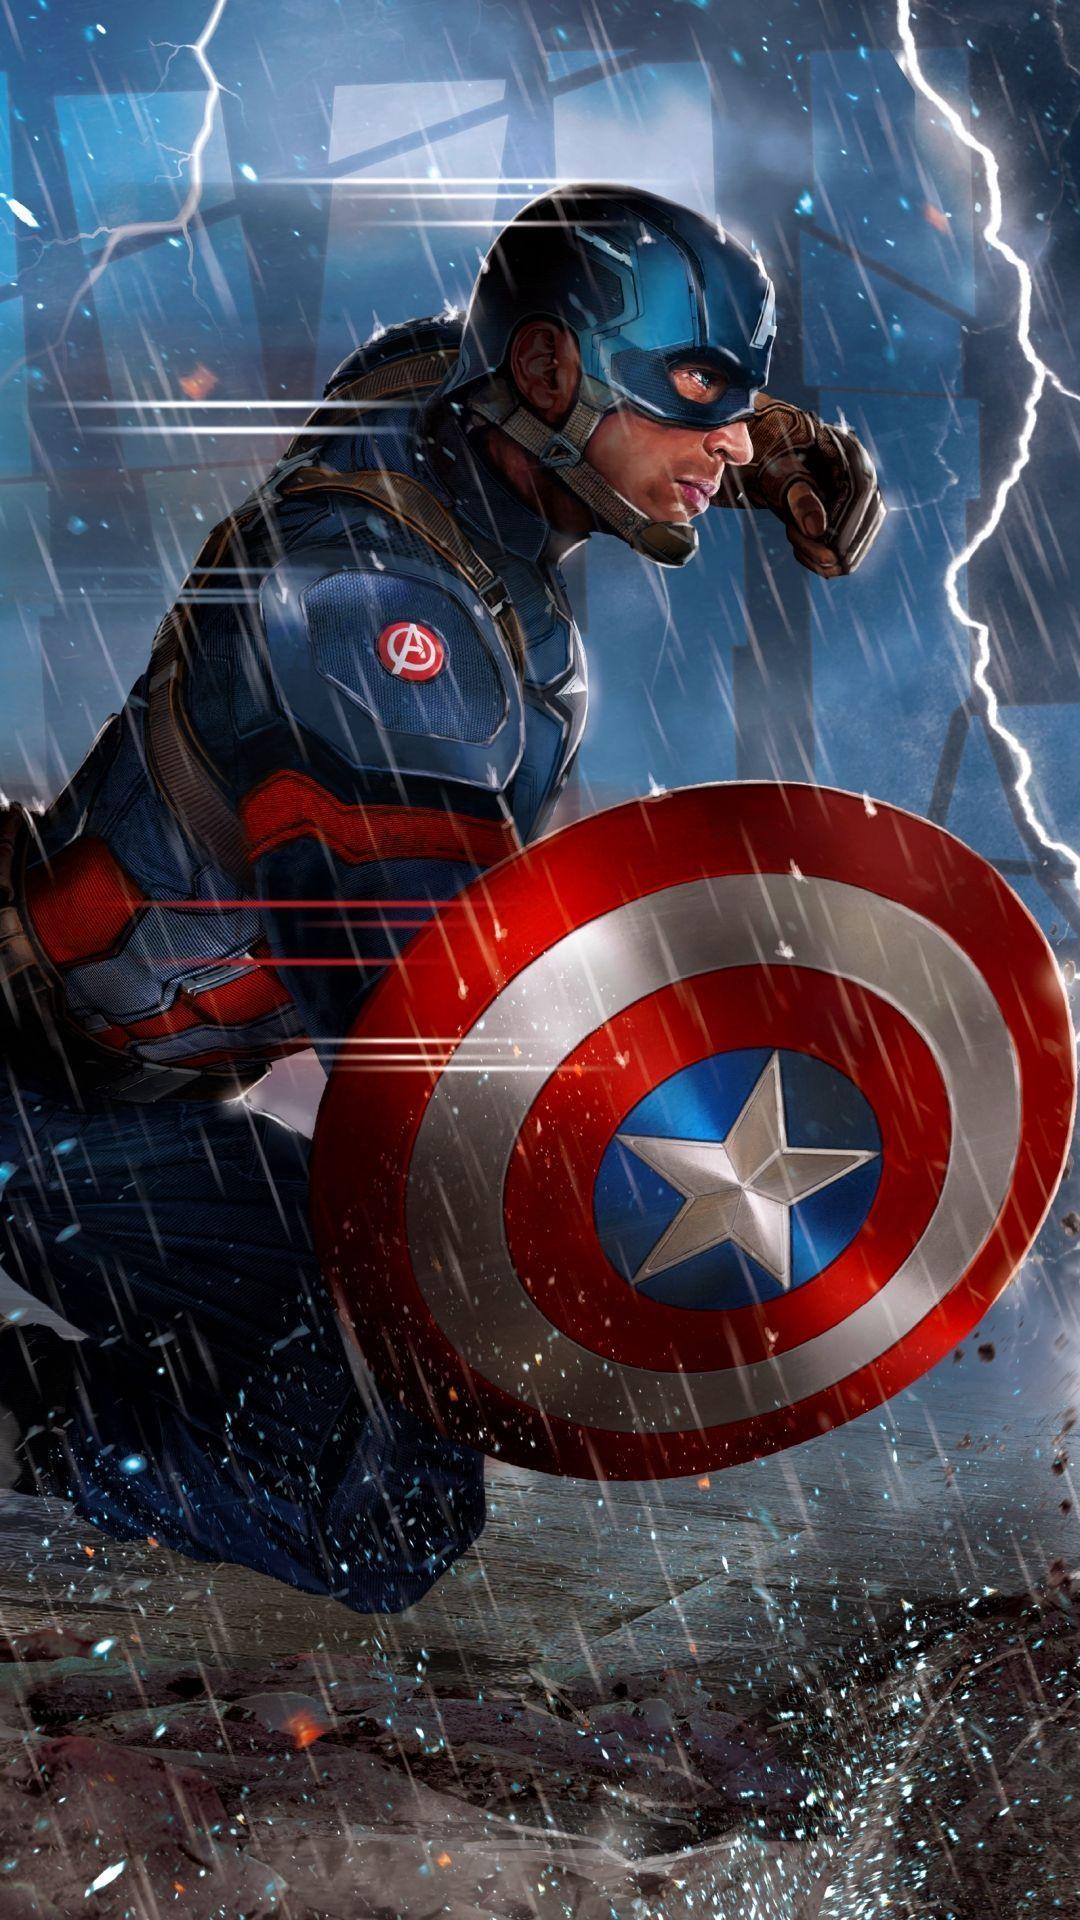 Captain America Android Iphone Desktop Hd Backgrounds Wallpapers 1080p 4k 118643 Hdwallpap Captain America Wallpaper Marvel Captain America Marvel